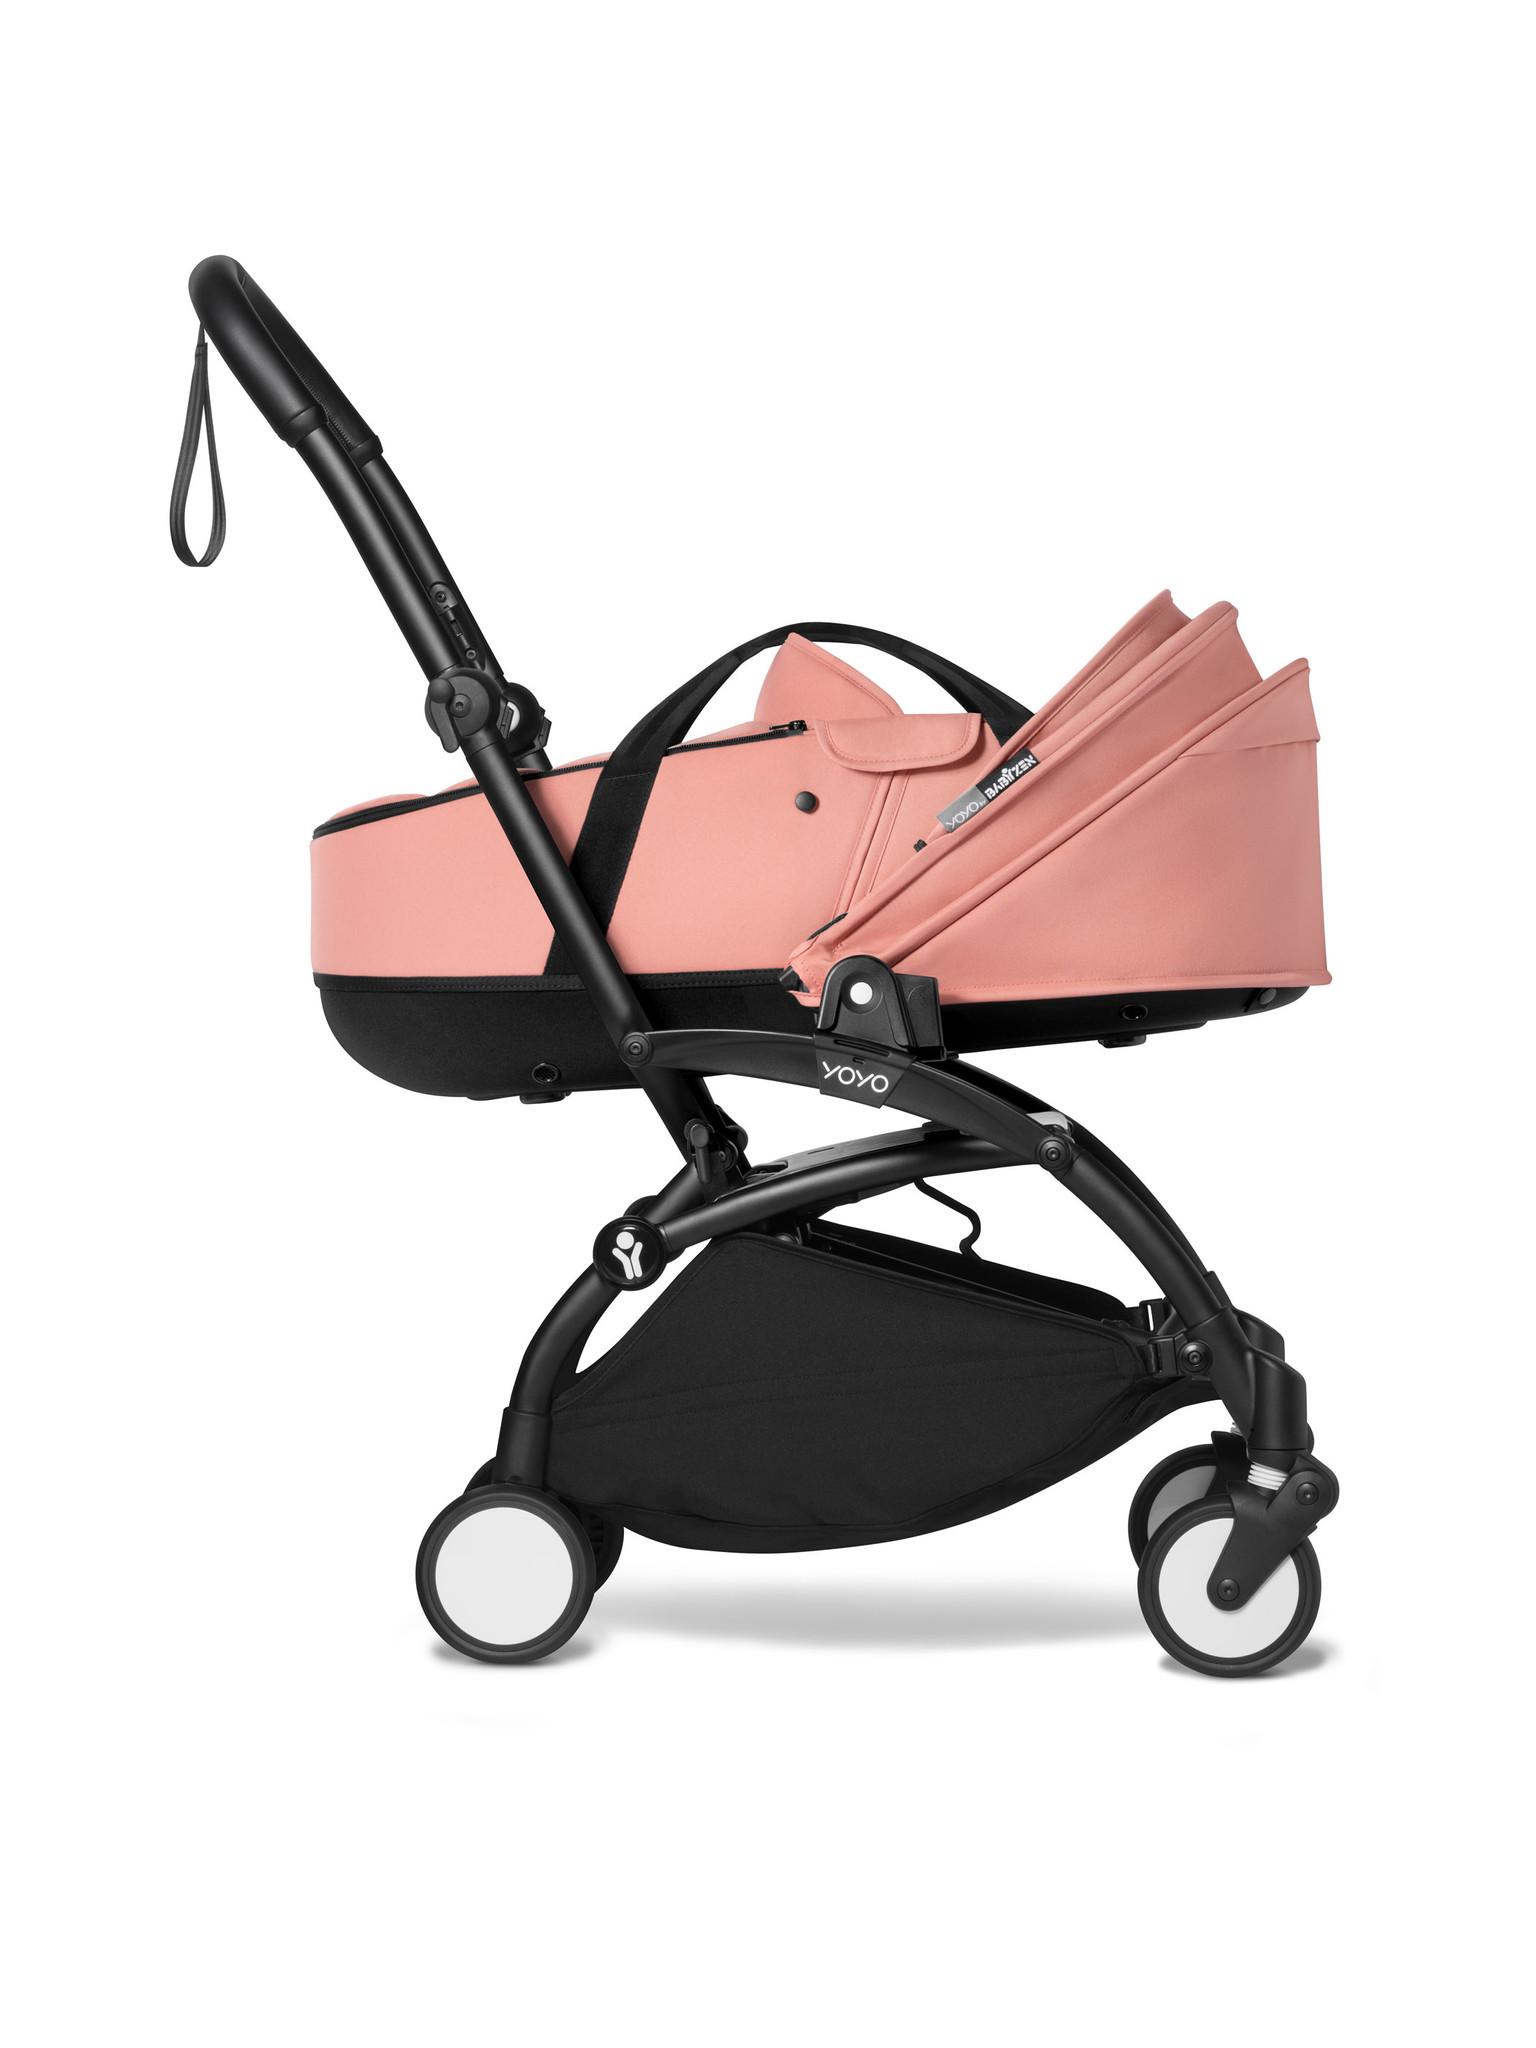 Babyzen Babyzen YOYO² schwarzer Rahmen mit YOYO Stubenwagen - Tragetasche - Ingwer